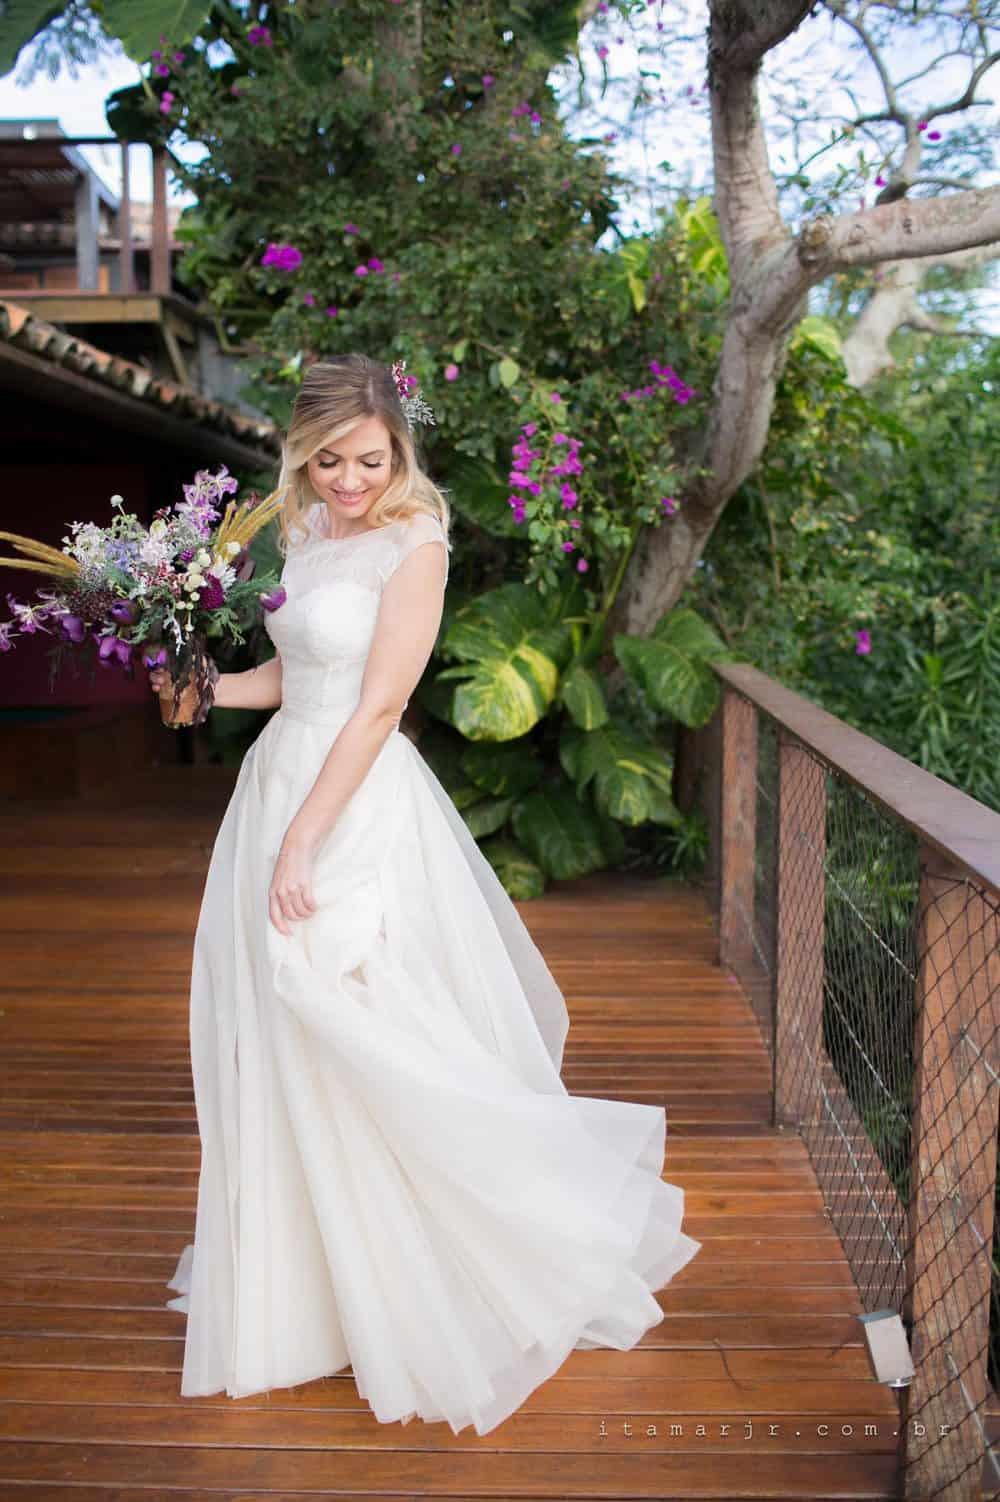 Casamento-Real-Natalia-e-Phelipe-vestido-de-noiva-2